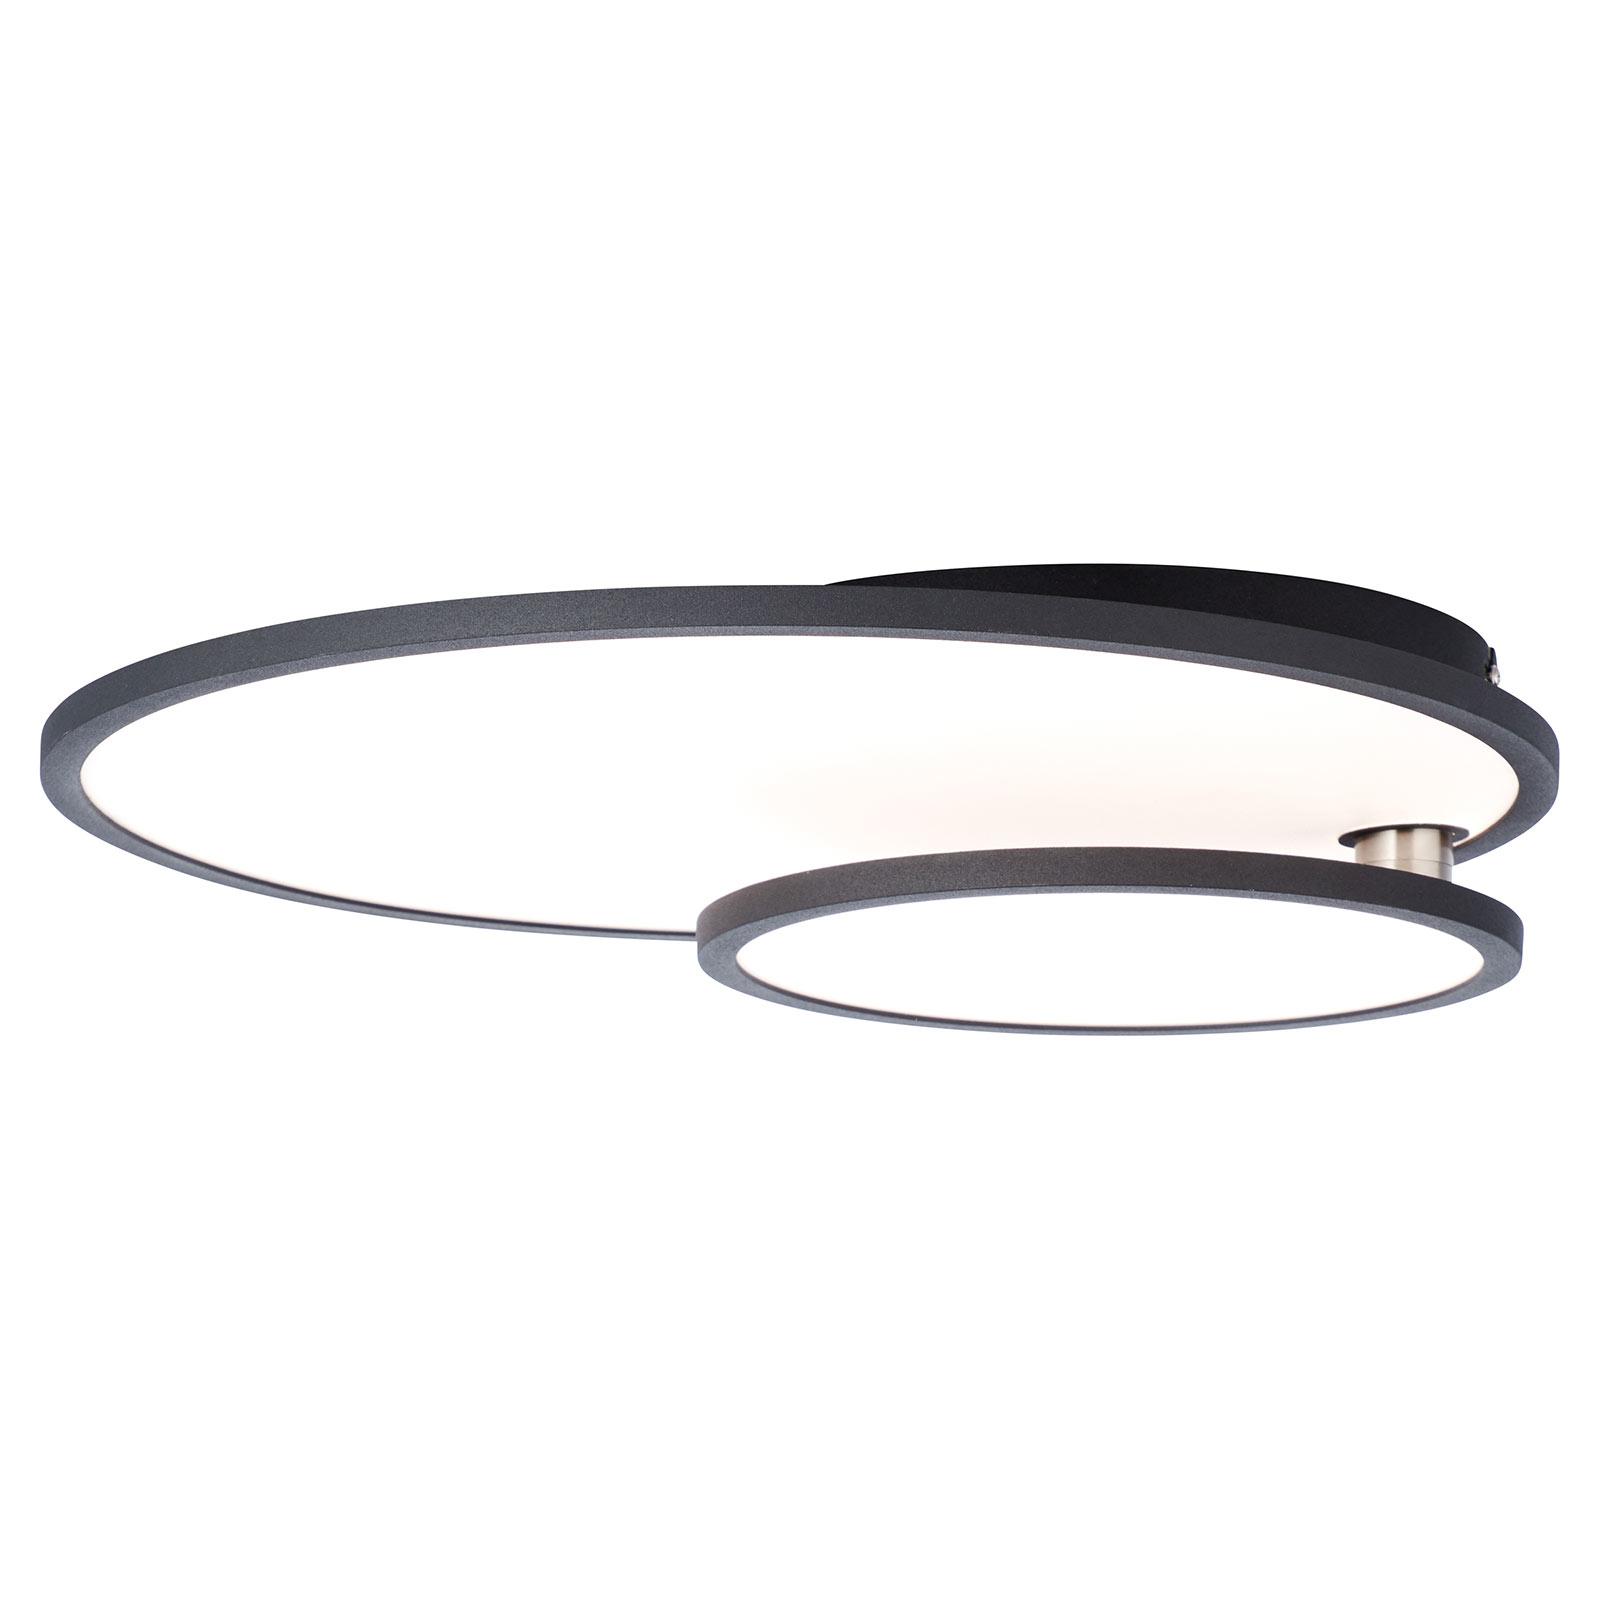 LED-taklampa Bility, rund, ram svart